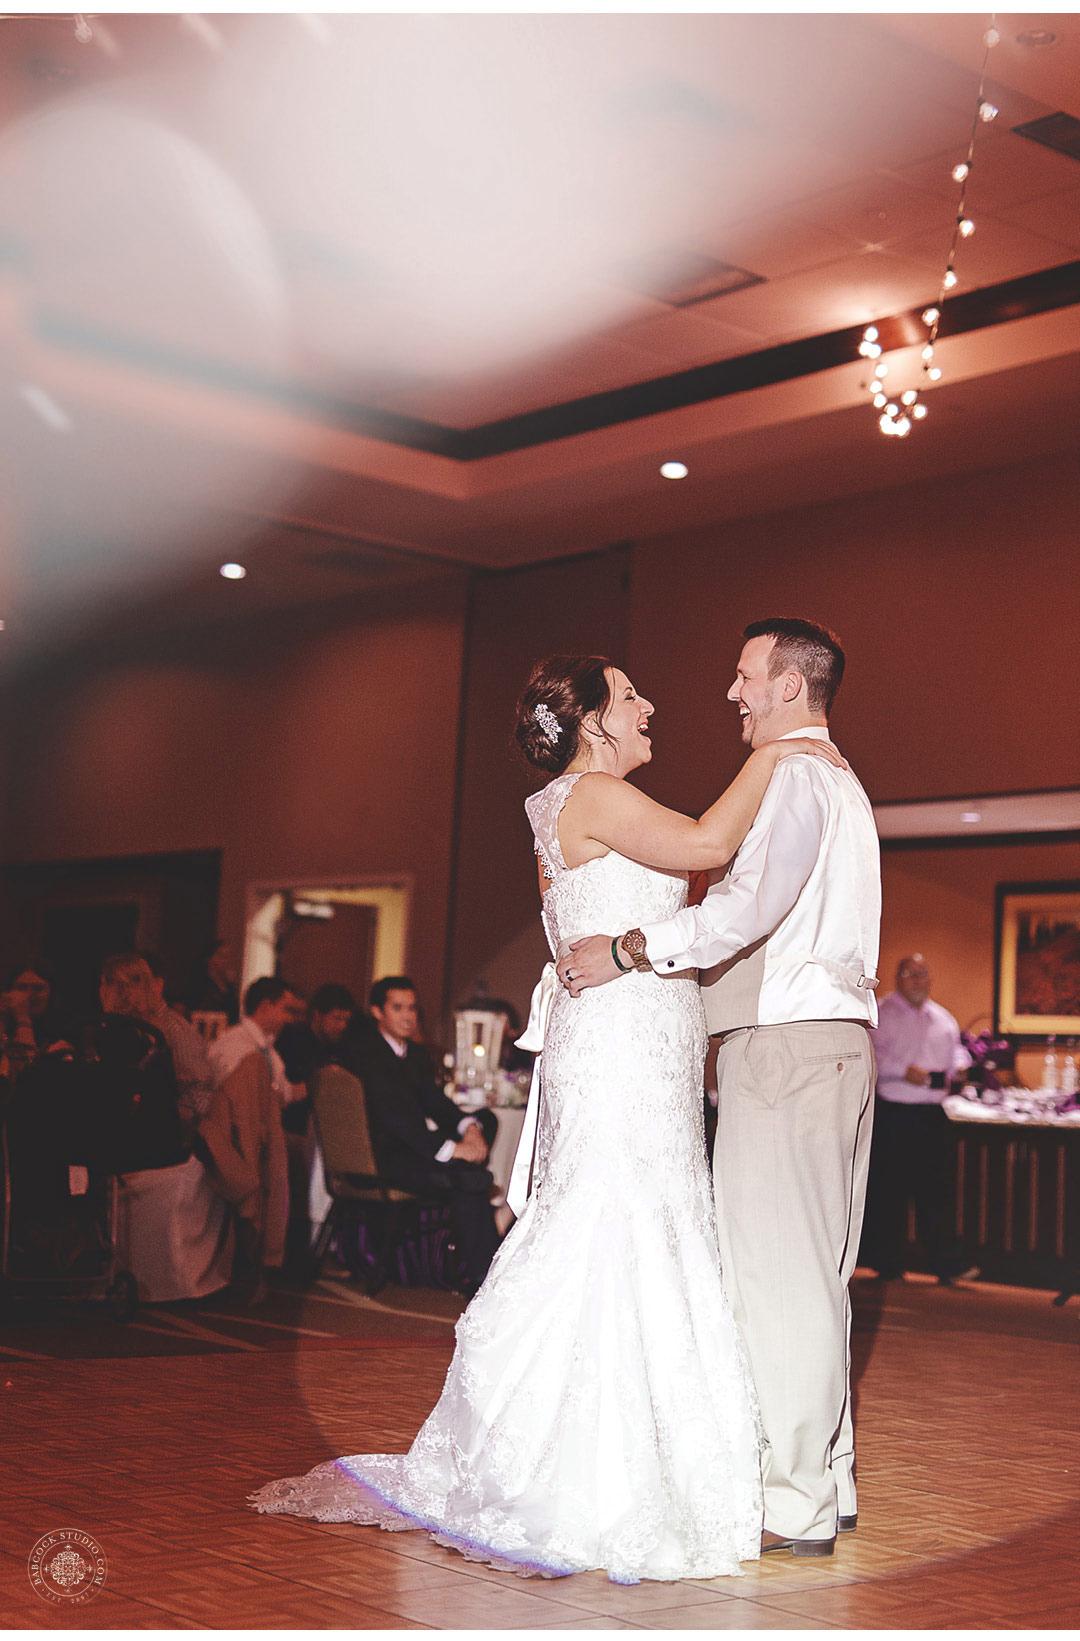 0049_sarah-john--dayton-wedding-photographer-cox-arboretum-49.jpg